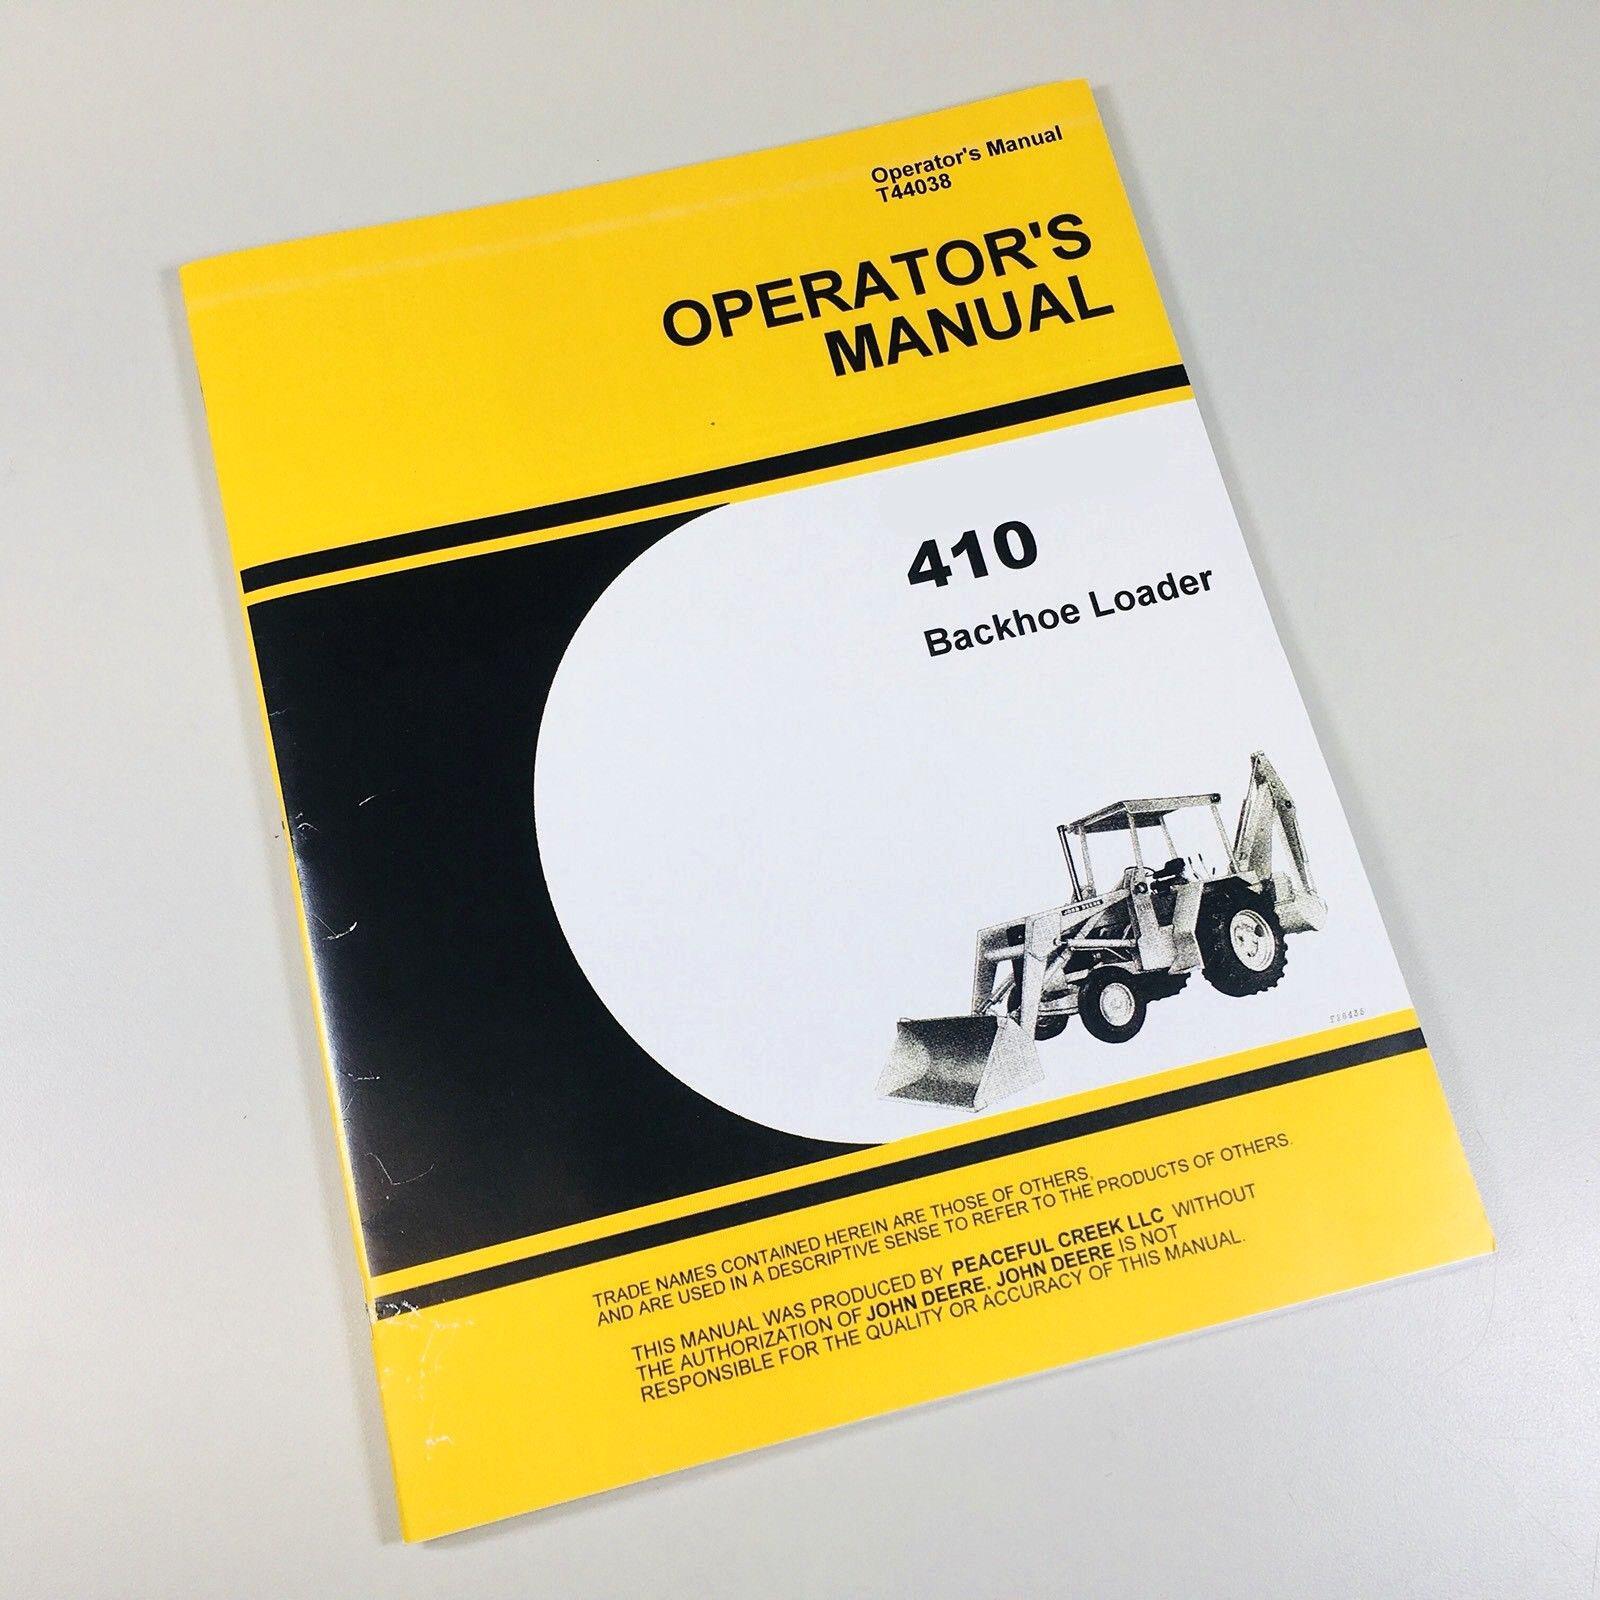 operators manual for john deere jd410 backhoe loader owners 410 rh ebay com john deere 310e backhoe operators manual john deere 310e backhoe operators manual